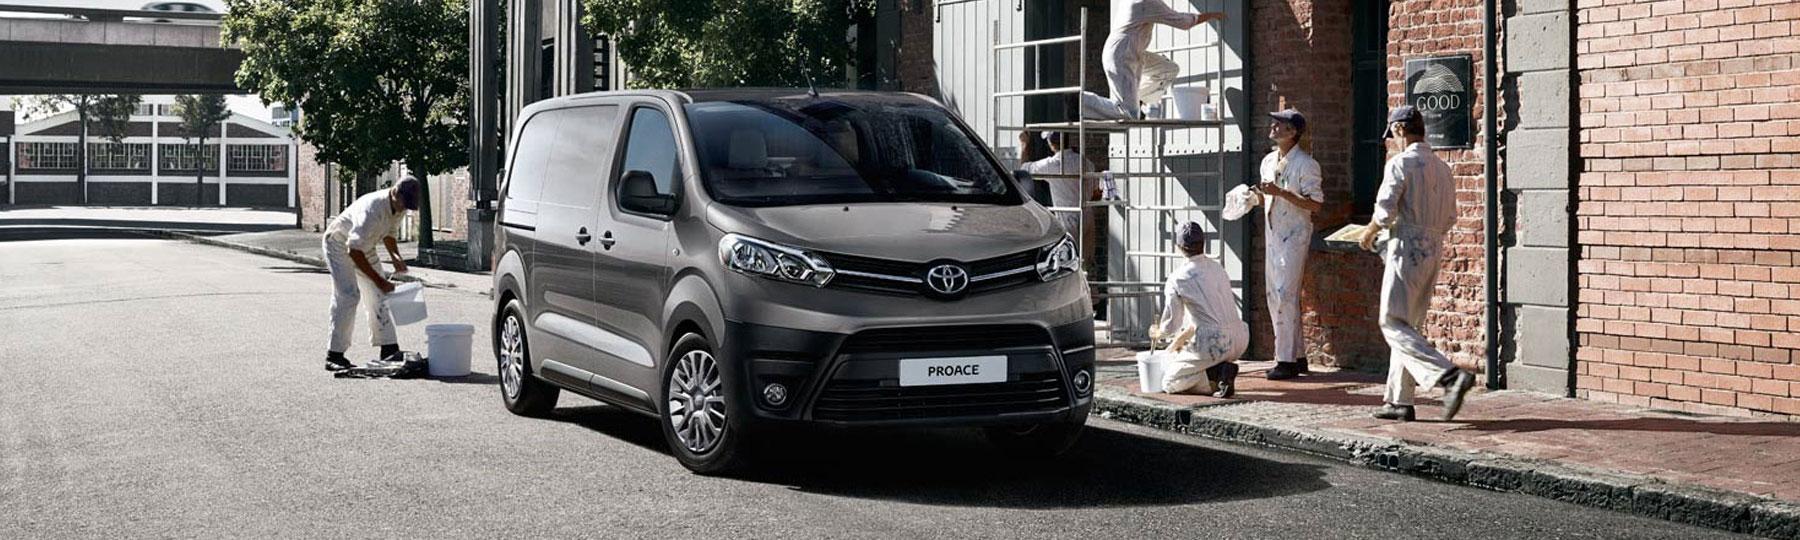 toyota Proace New Van Offer